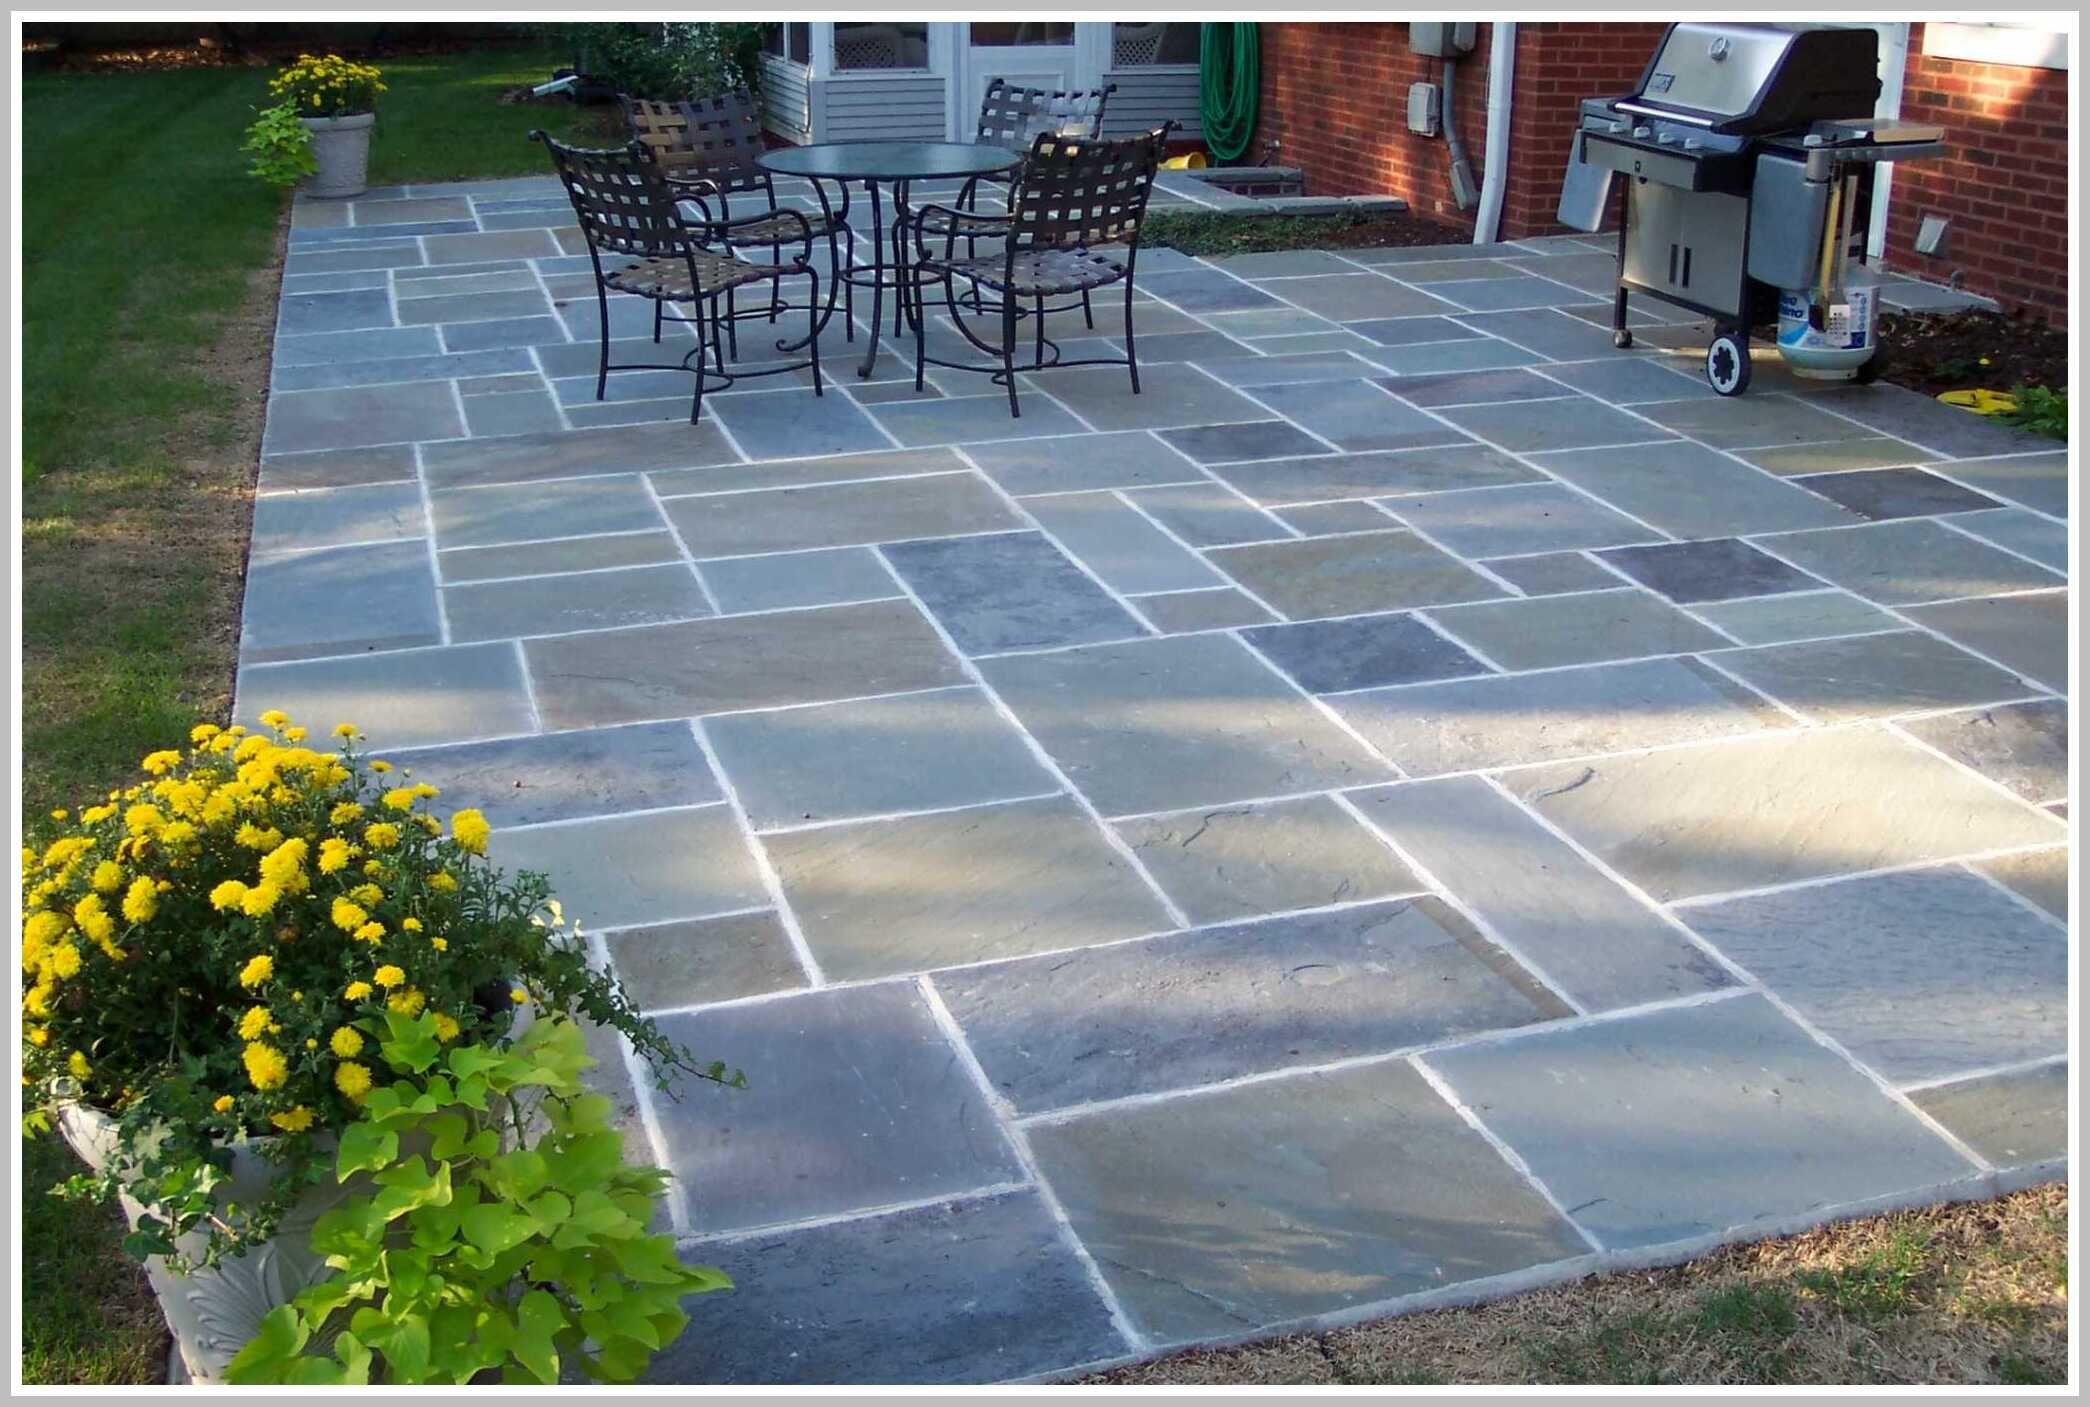 53 Reference Of Stone Patio Tiles Outdoor In 2020 Patio Stones Bluestone Patio Patio Design